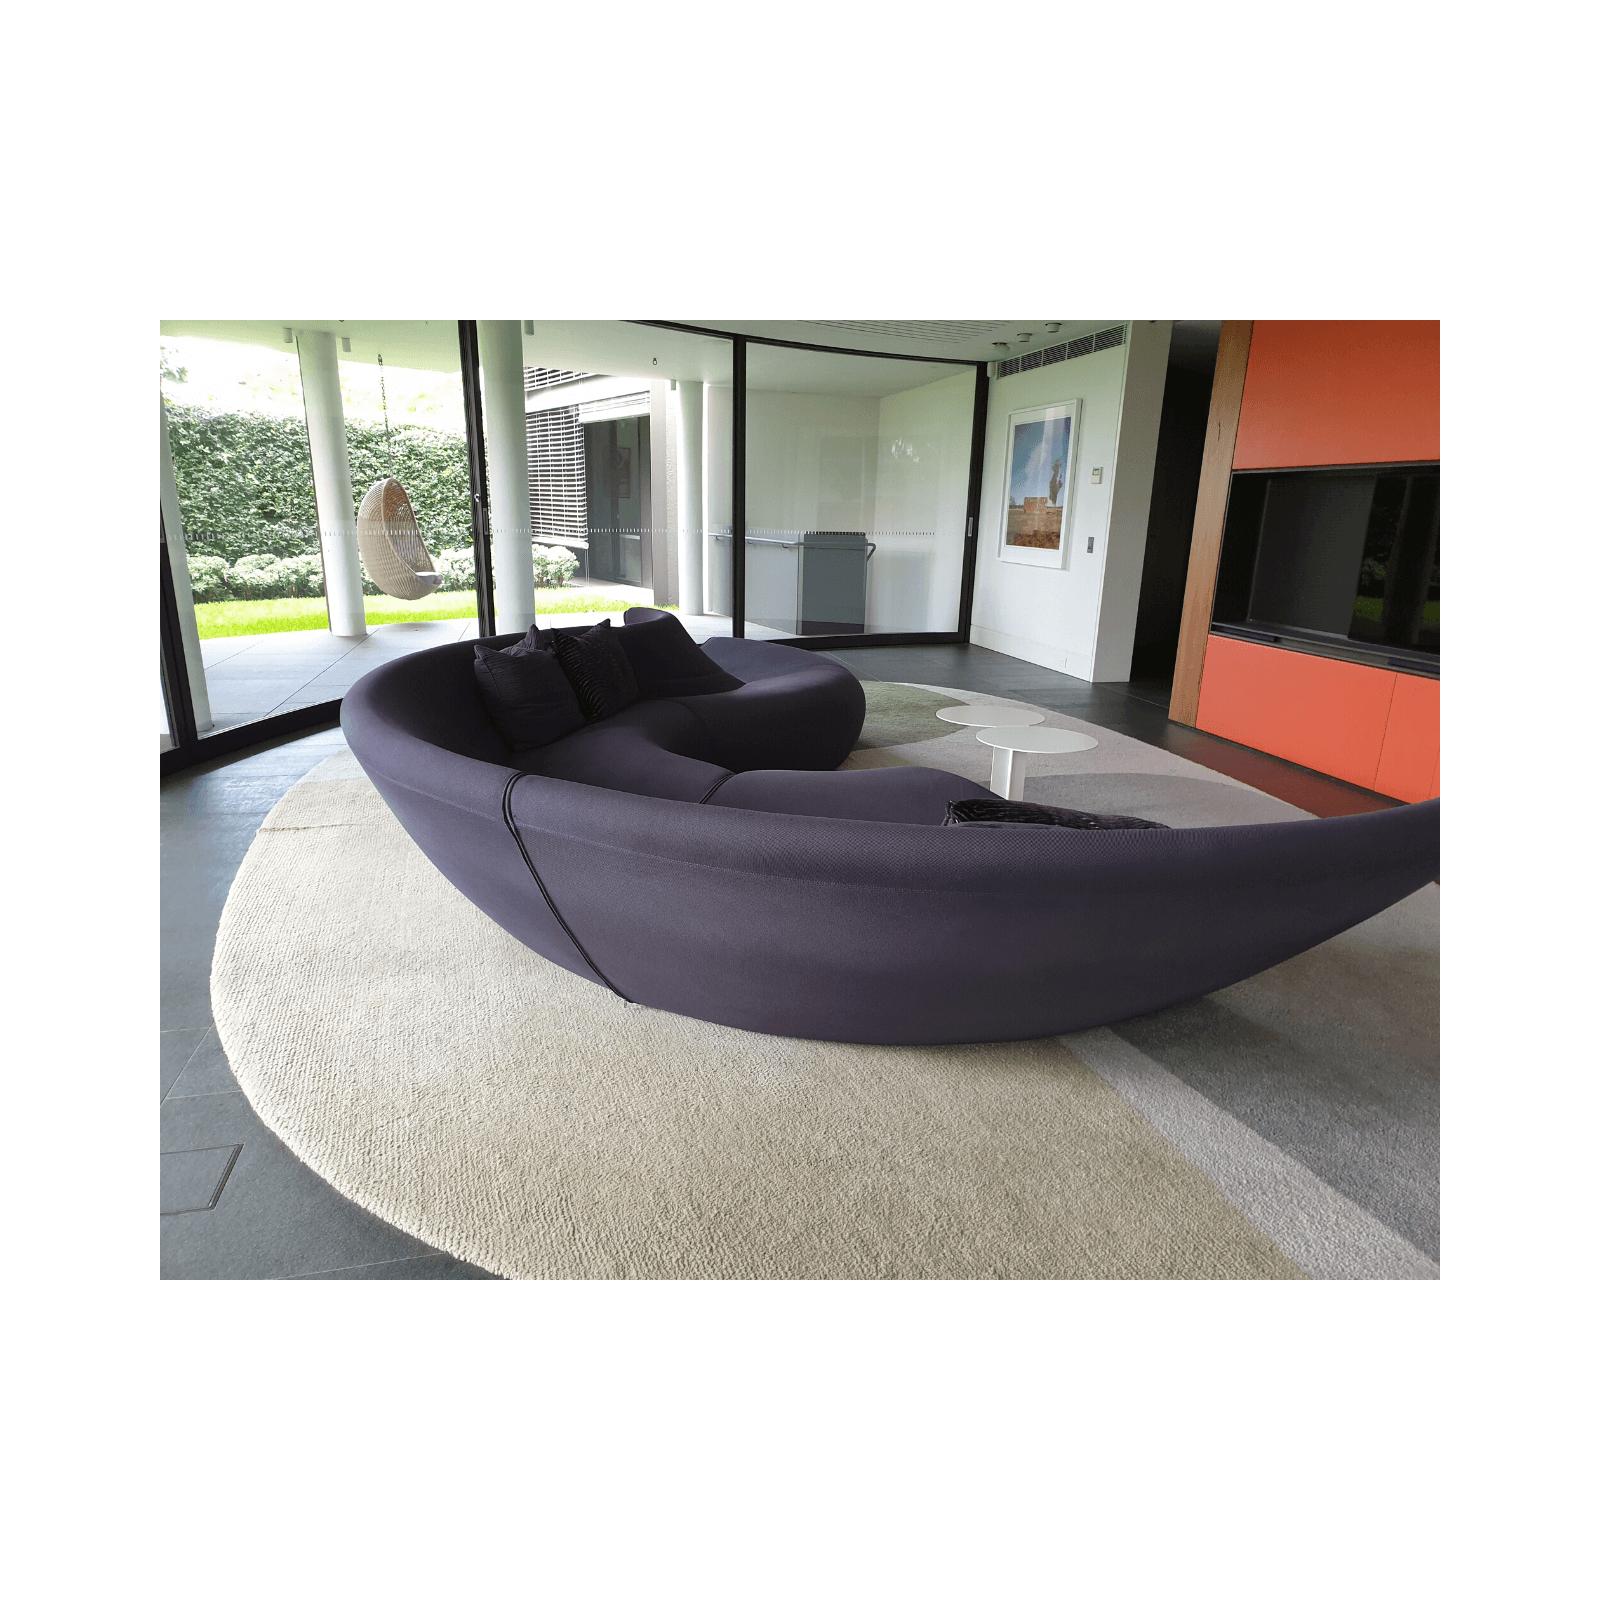 Two Design Lovers Walter Knoll Circle Sofa 3